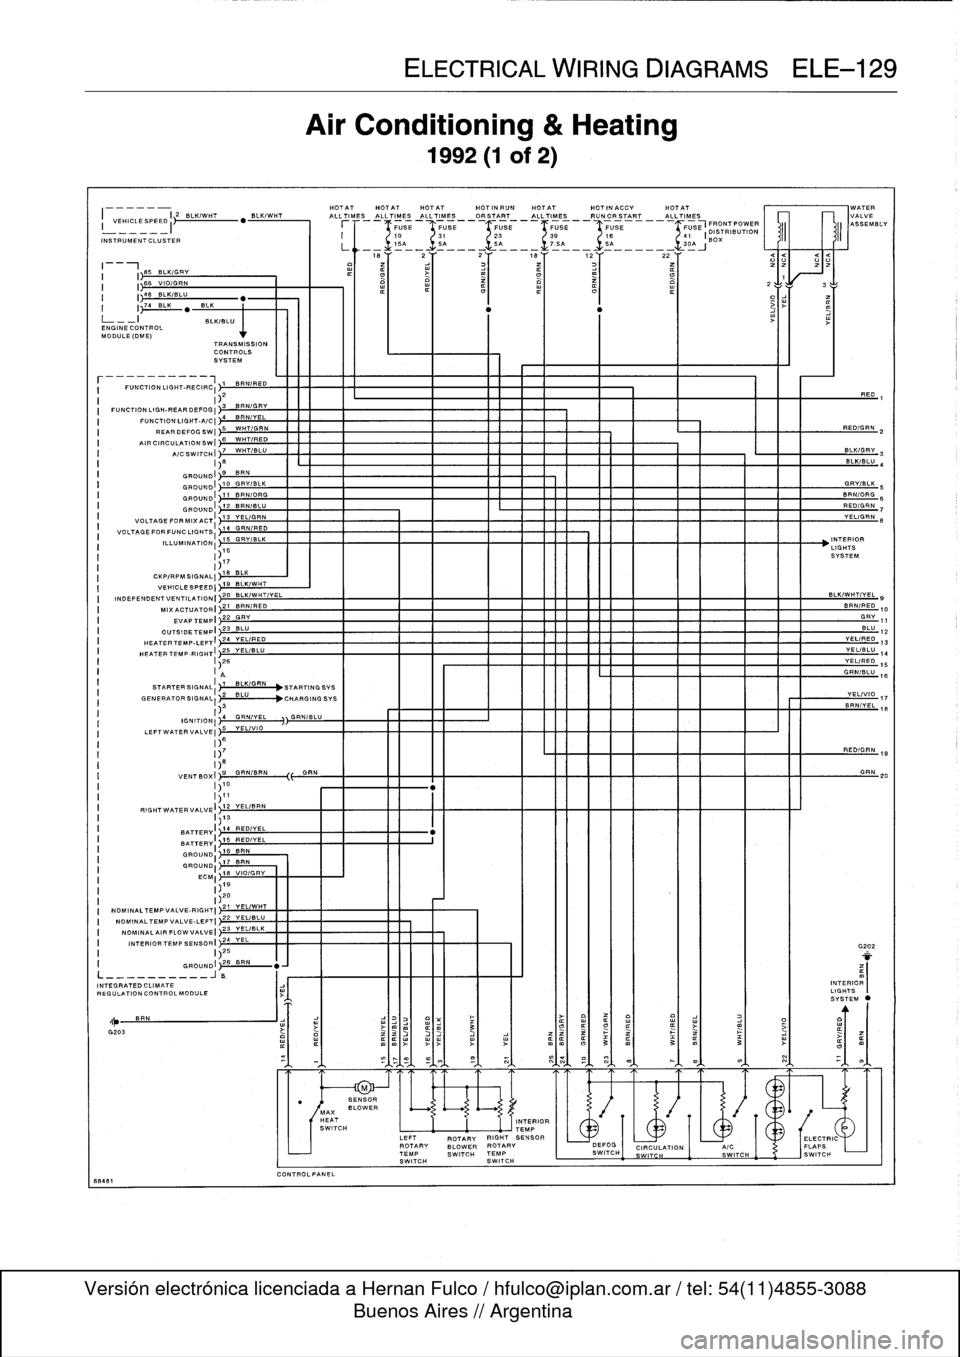 Battery Bmw 323i 1996 E36 Workshop Manual Airbag Wiring Diagram